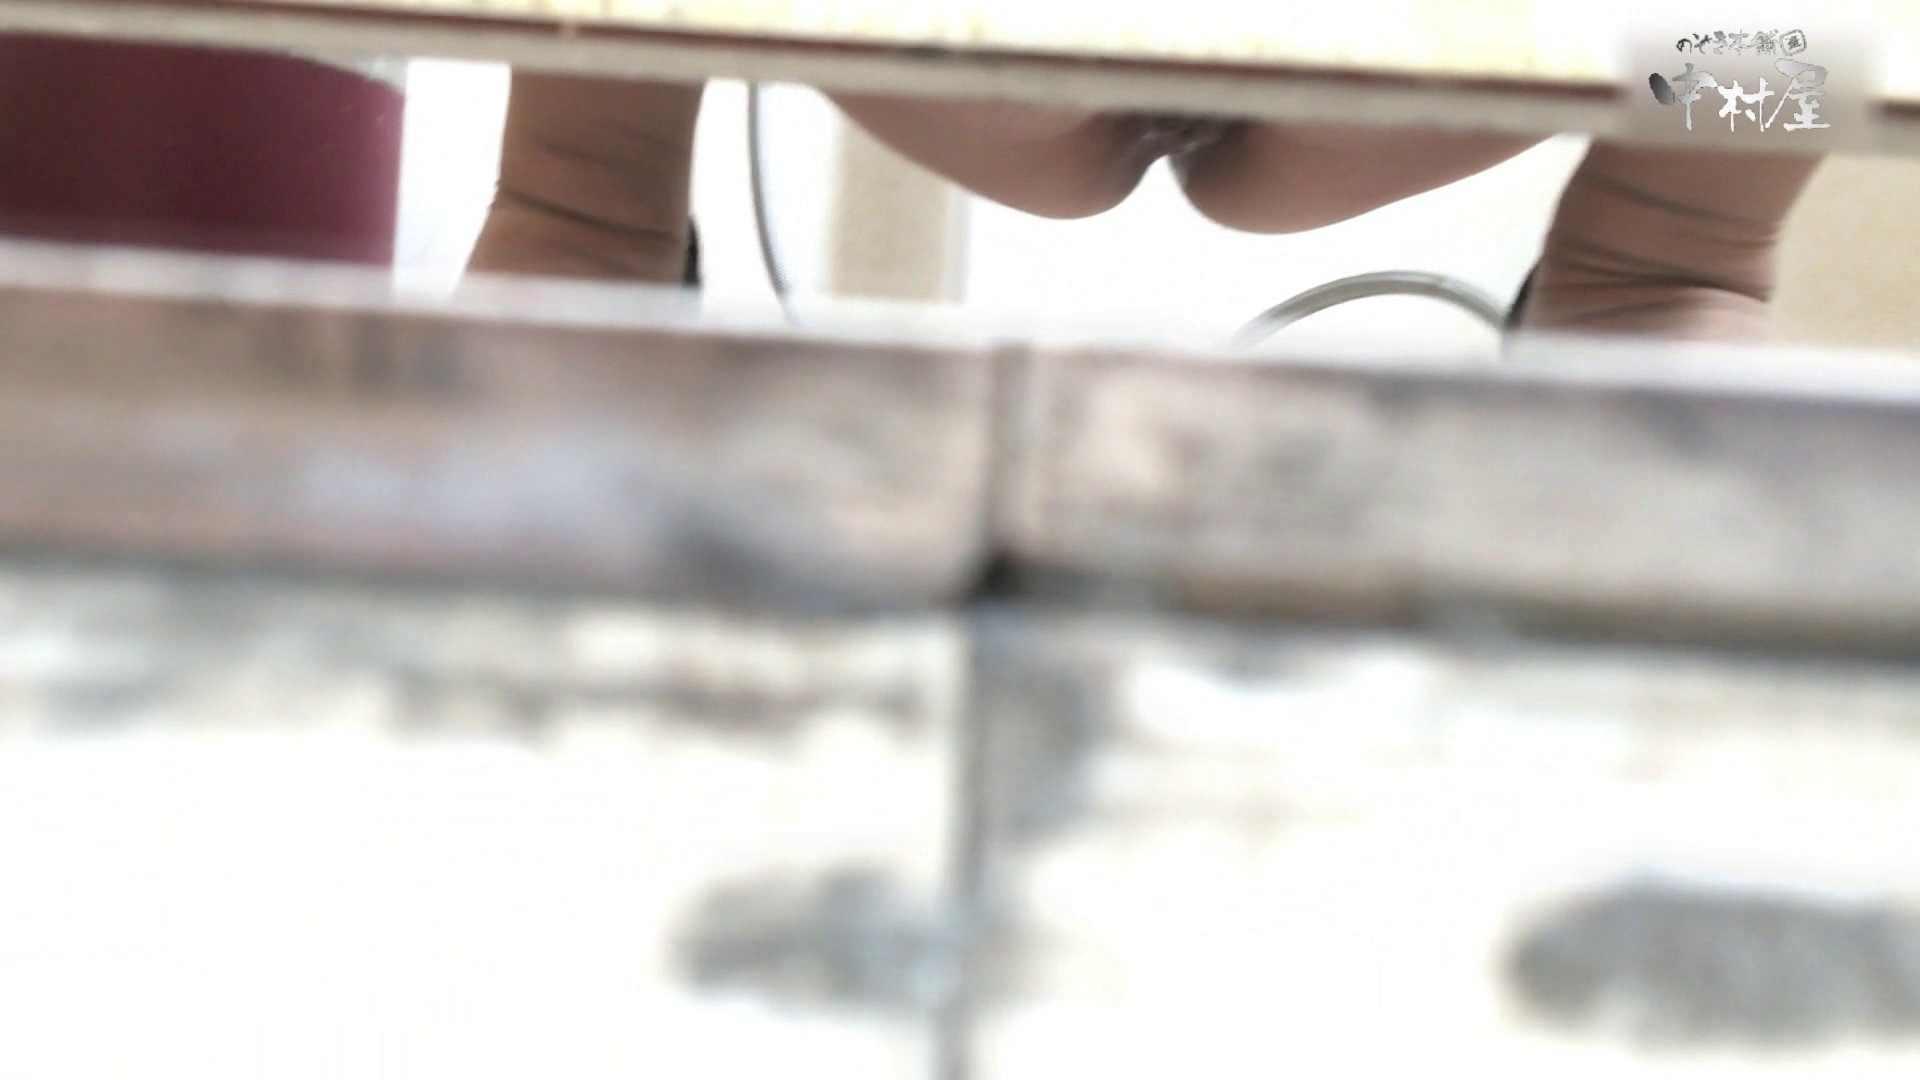 GOD HAND 芸術大学盗撮‼vol.110 OLエロ画像 | 盗撮  85PICs 5